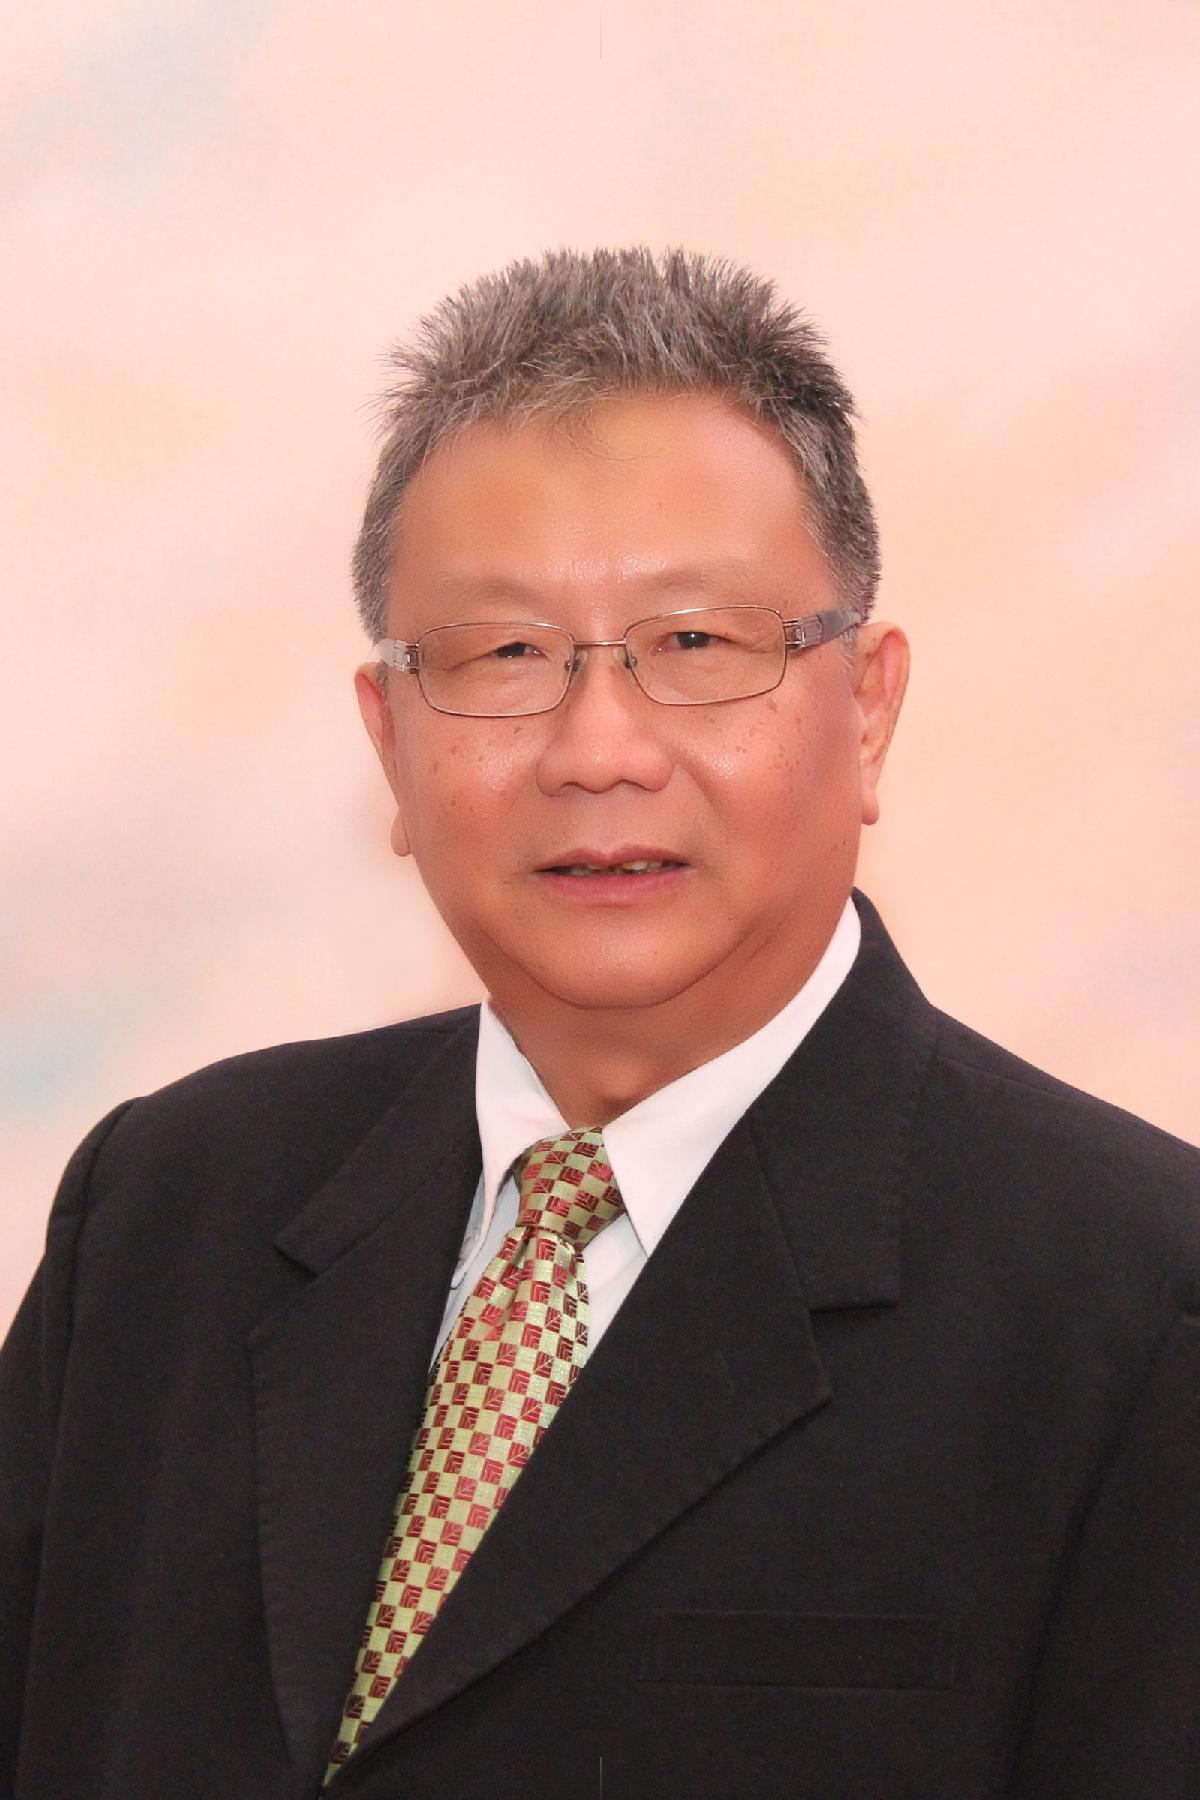 <h80>江瑞财</h80><br>Kung Swee Chai